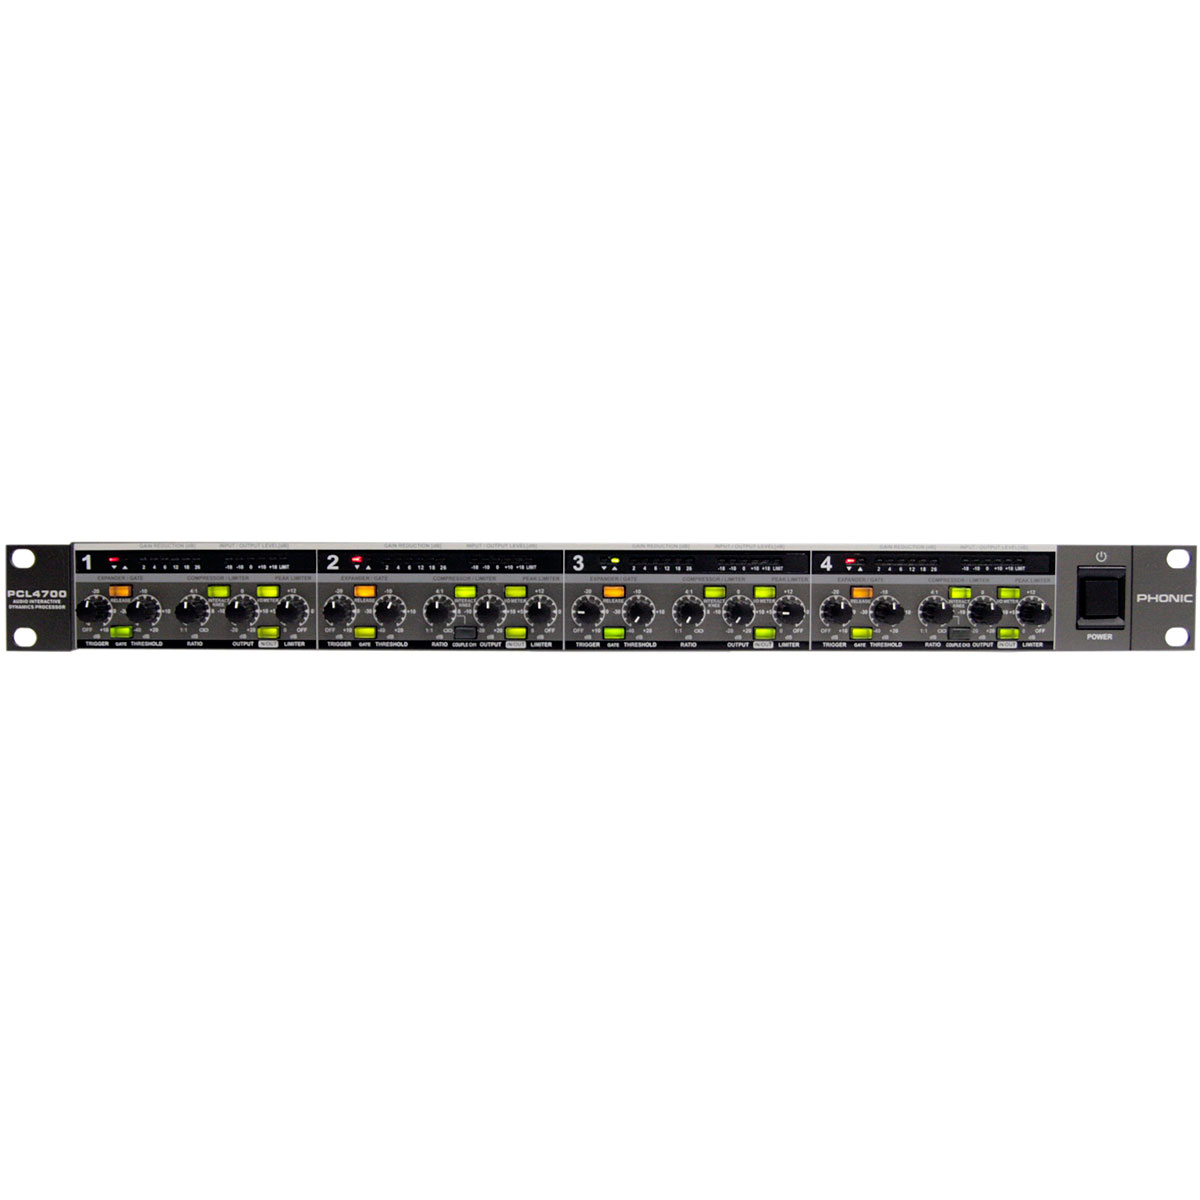 PCL4700 - Processador de Áudio PCL 4700 - Phonic